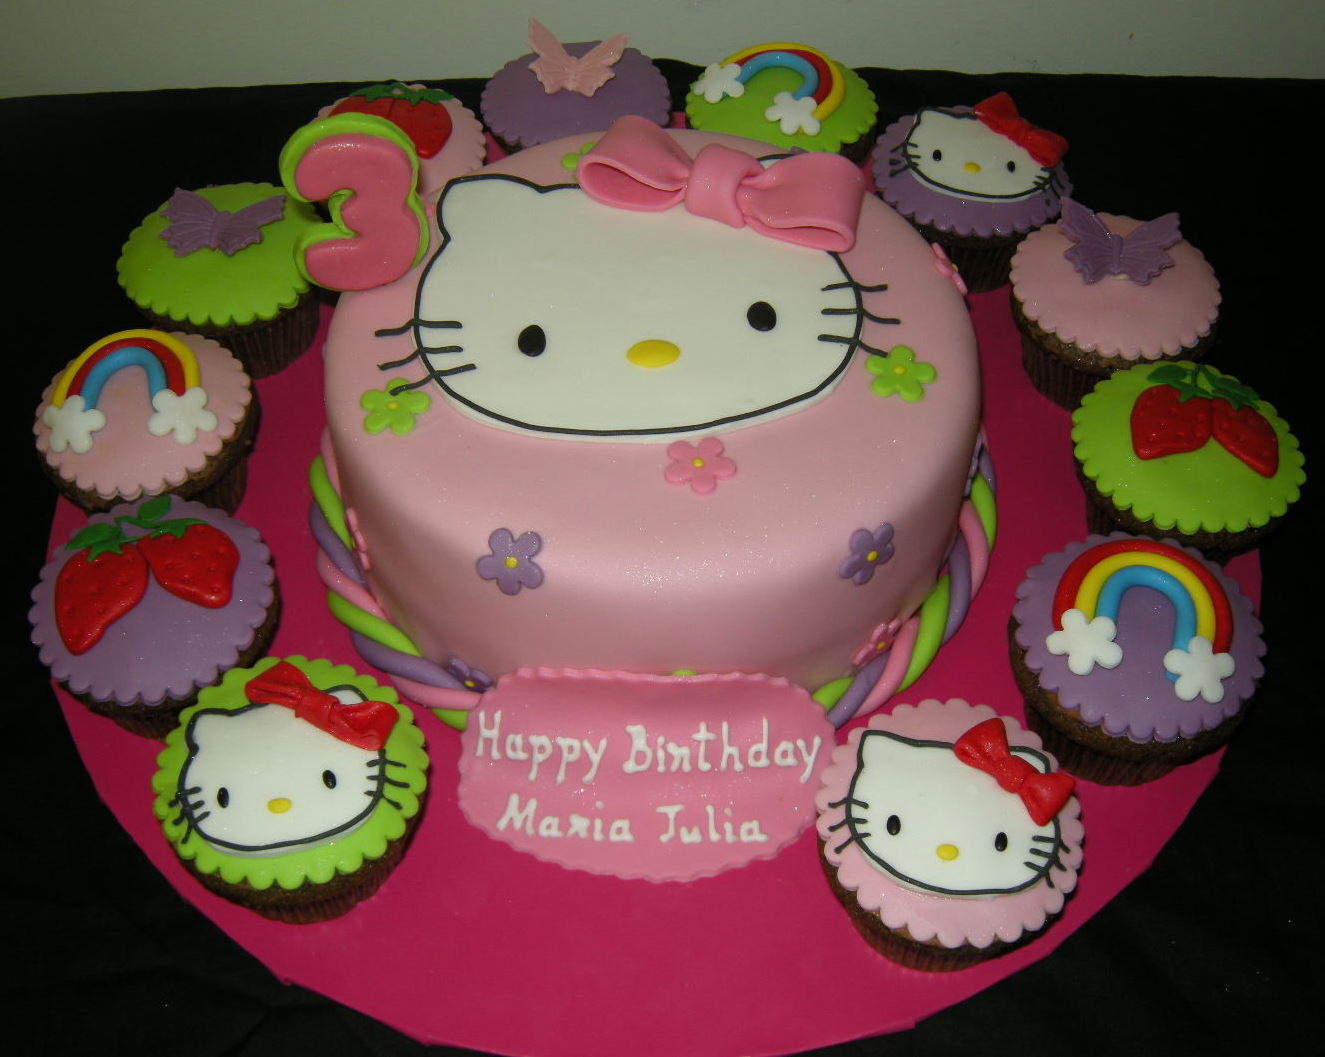 Harshis Cakes Bakes Cakes For Maria Julia